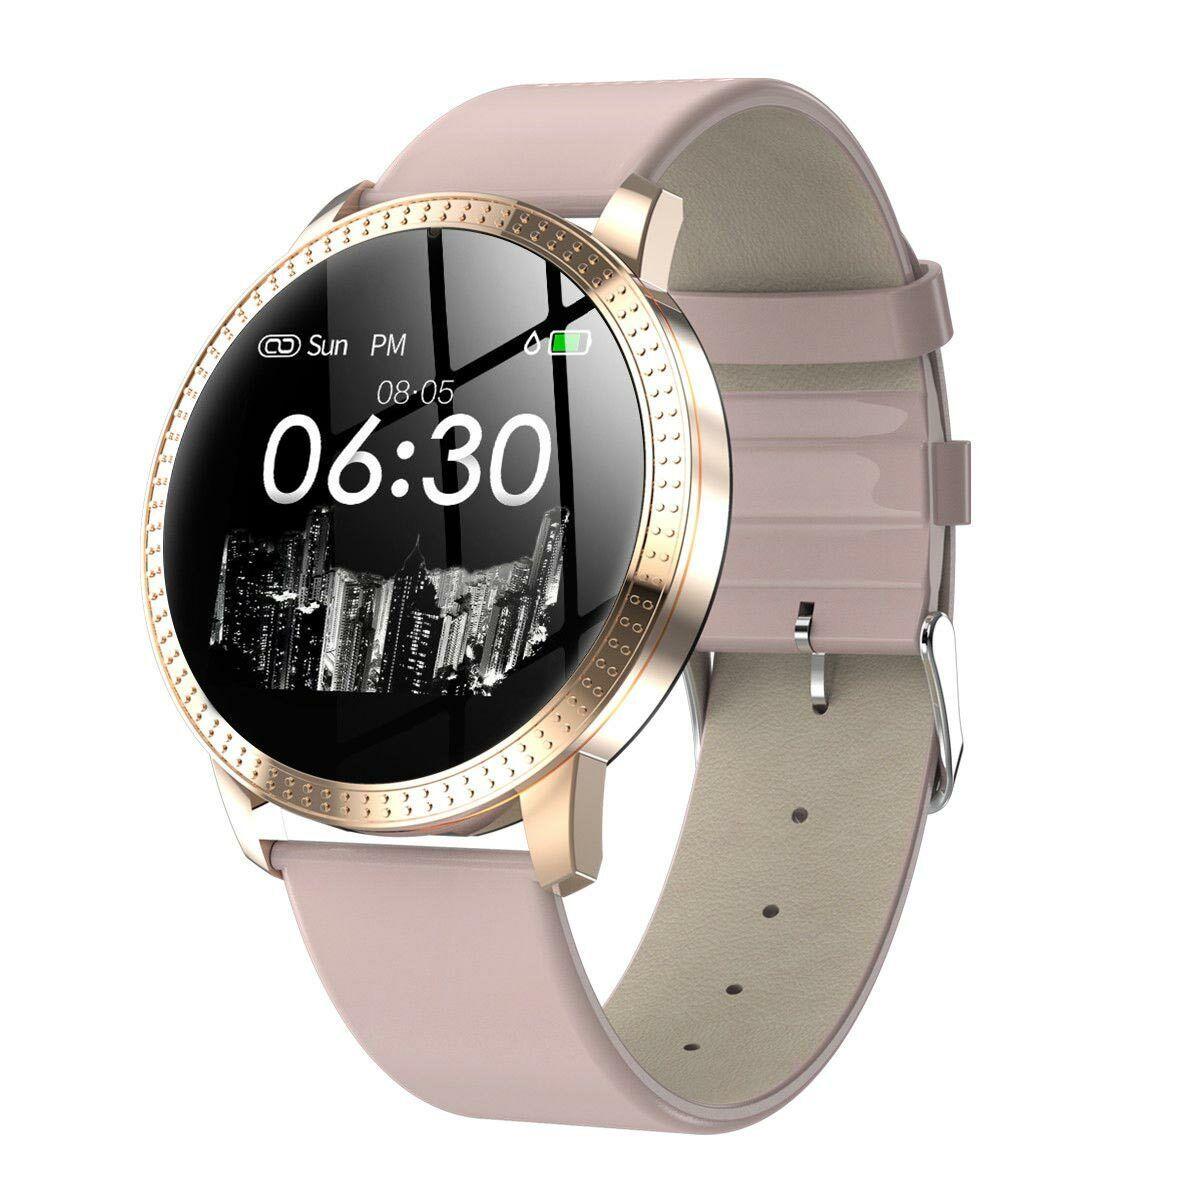 Smart Watch Fitness Tracker Heart Rate Blood Pressure Waterproof Tempered Mirror 2